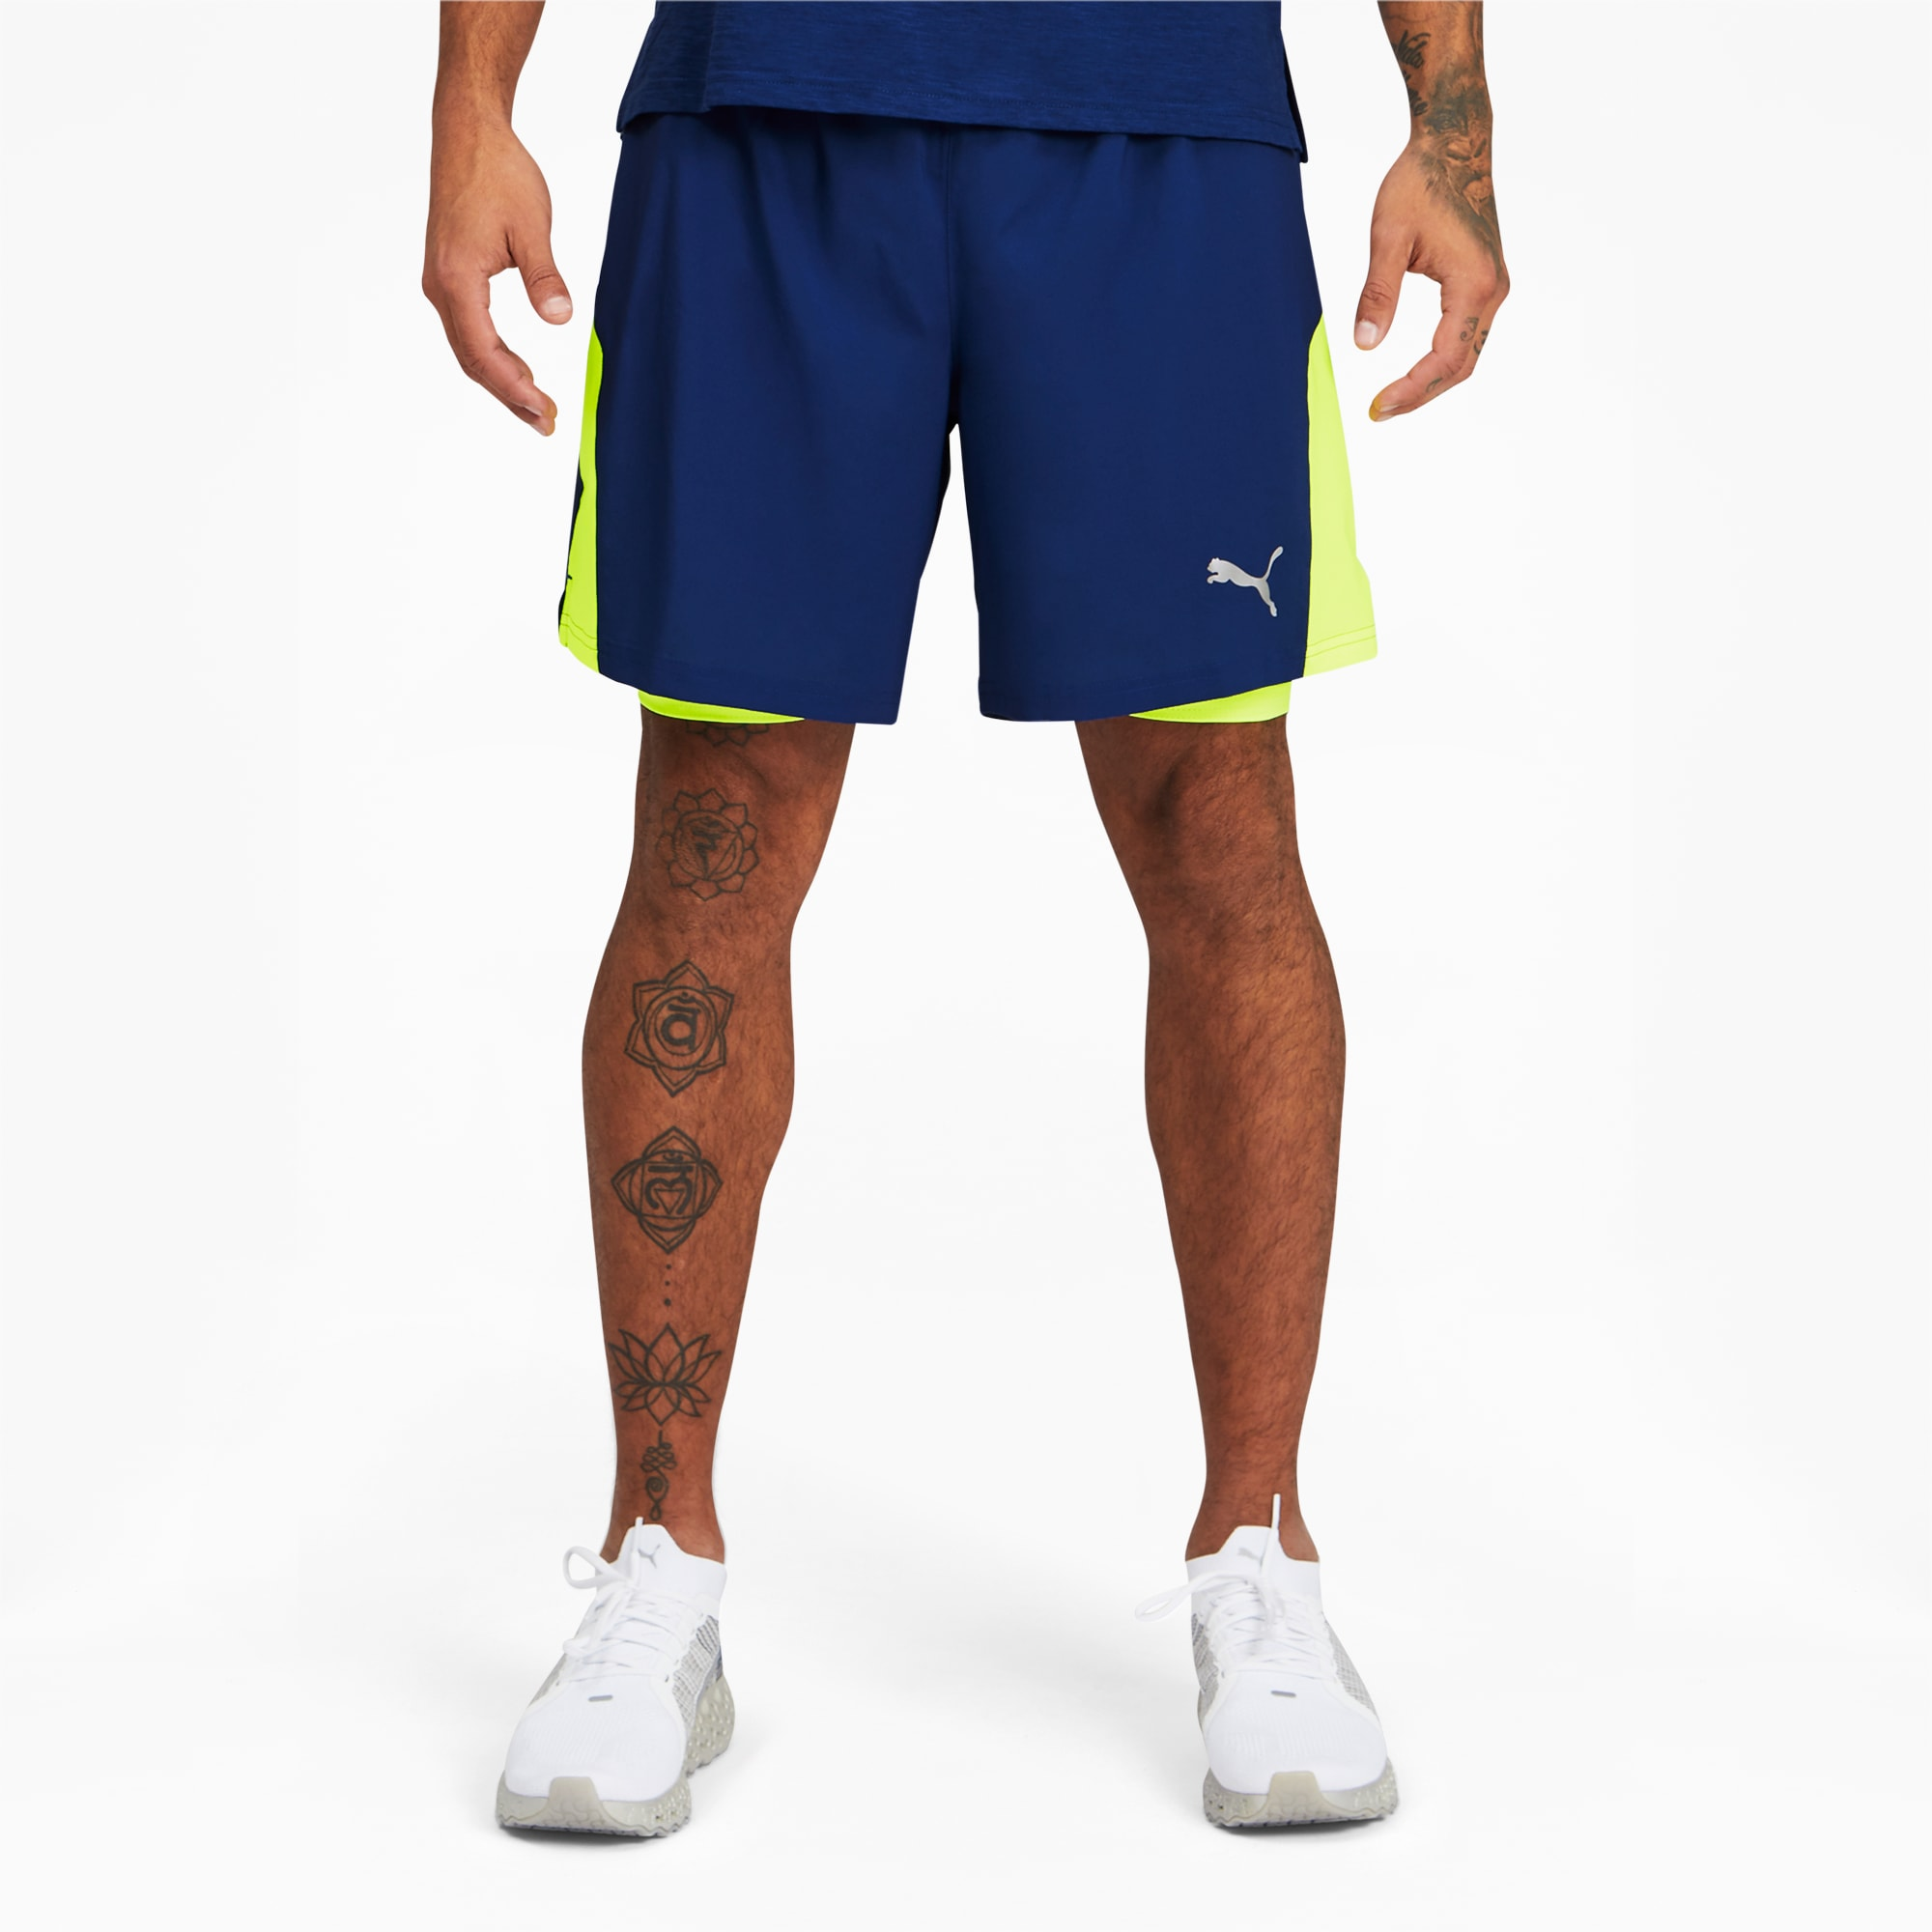 Favorite 2-in-1 Men's Woven Running Shorts